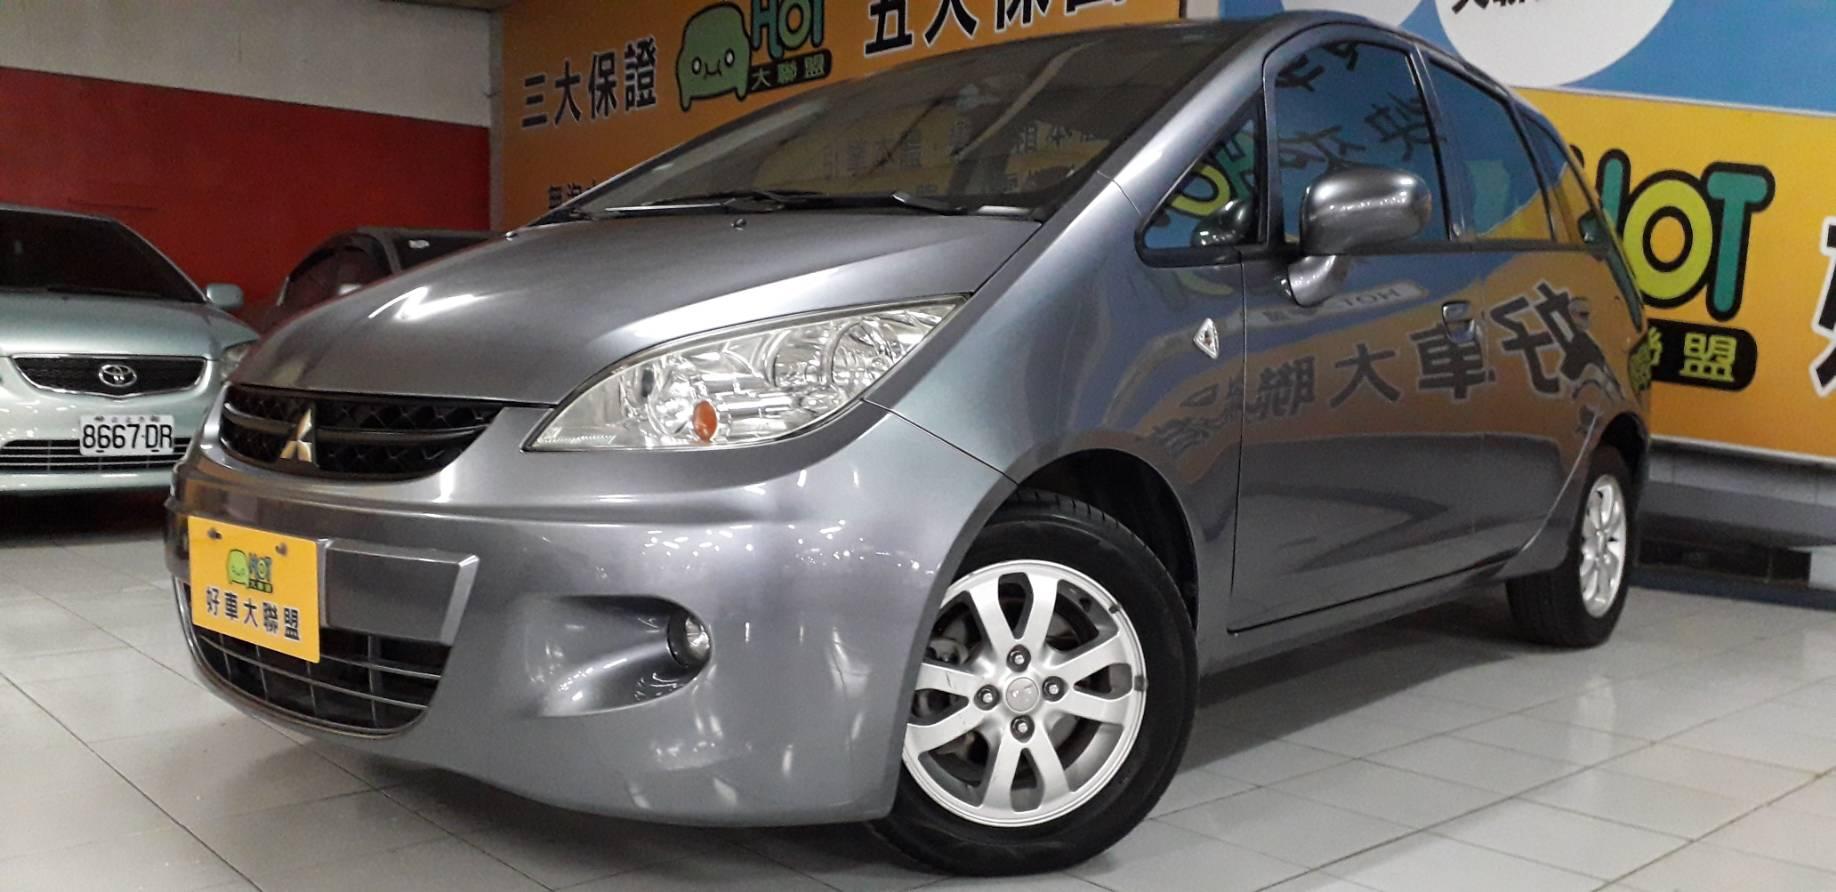 2010 Mitsubishi 三菱 Colt Plus